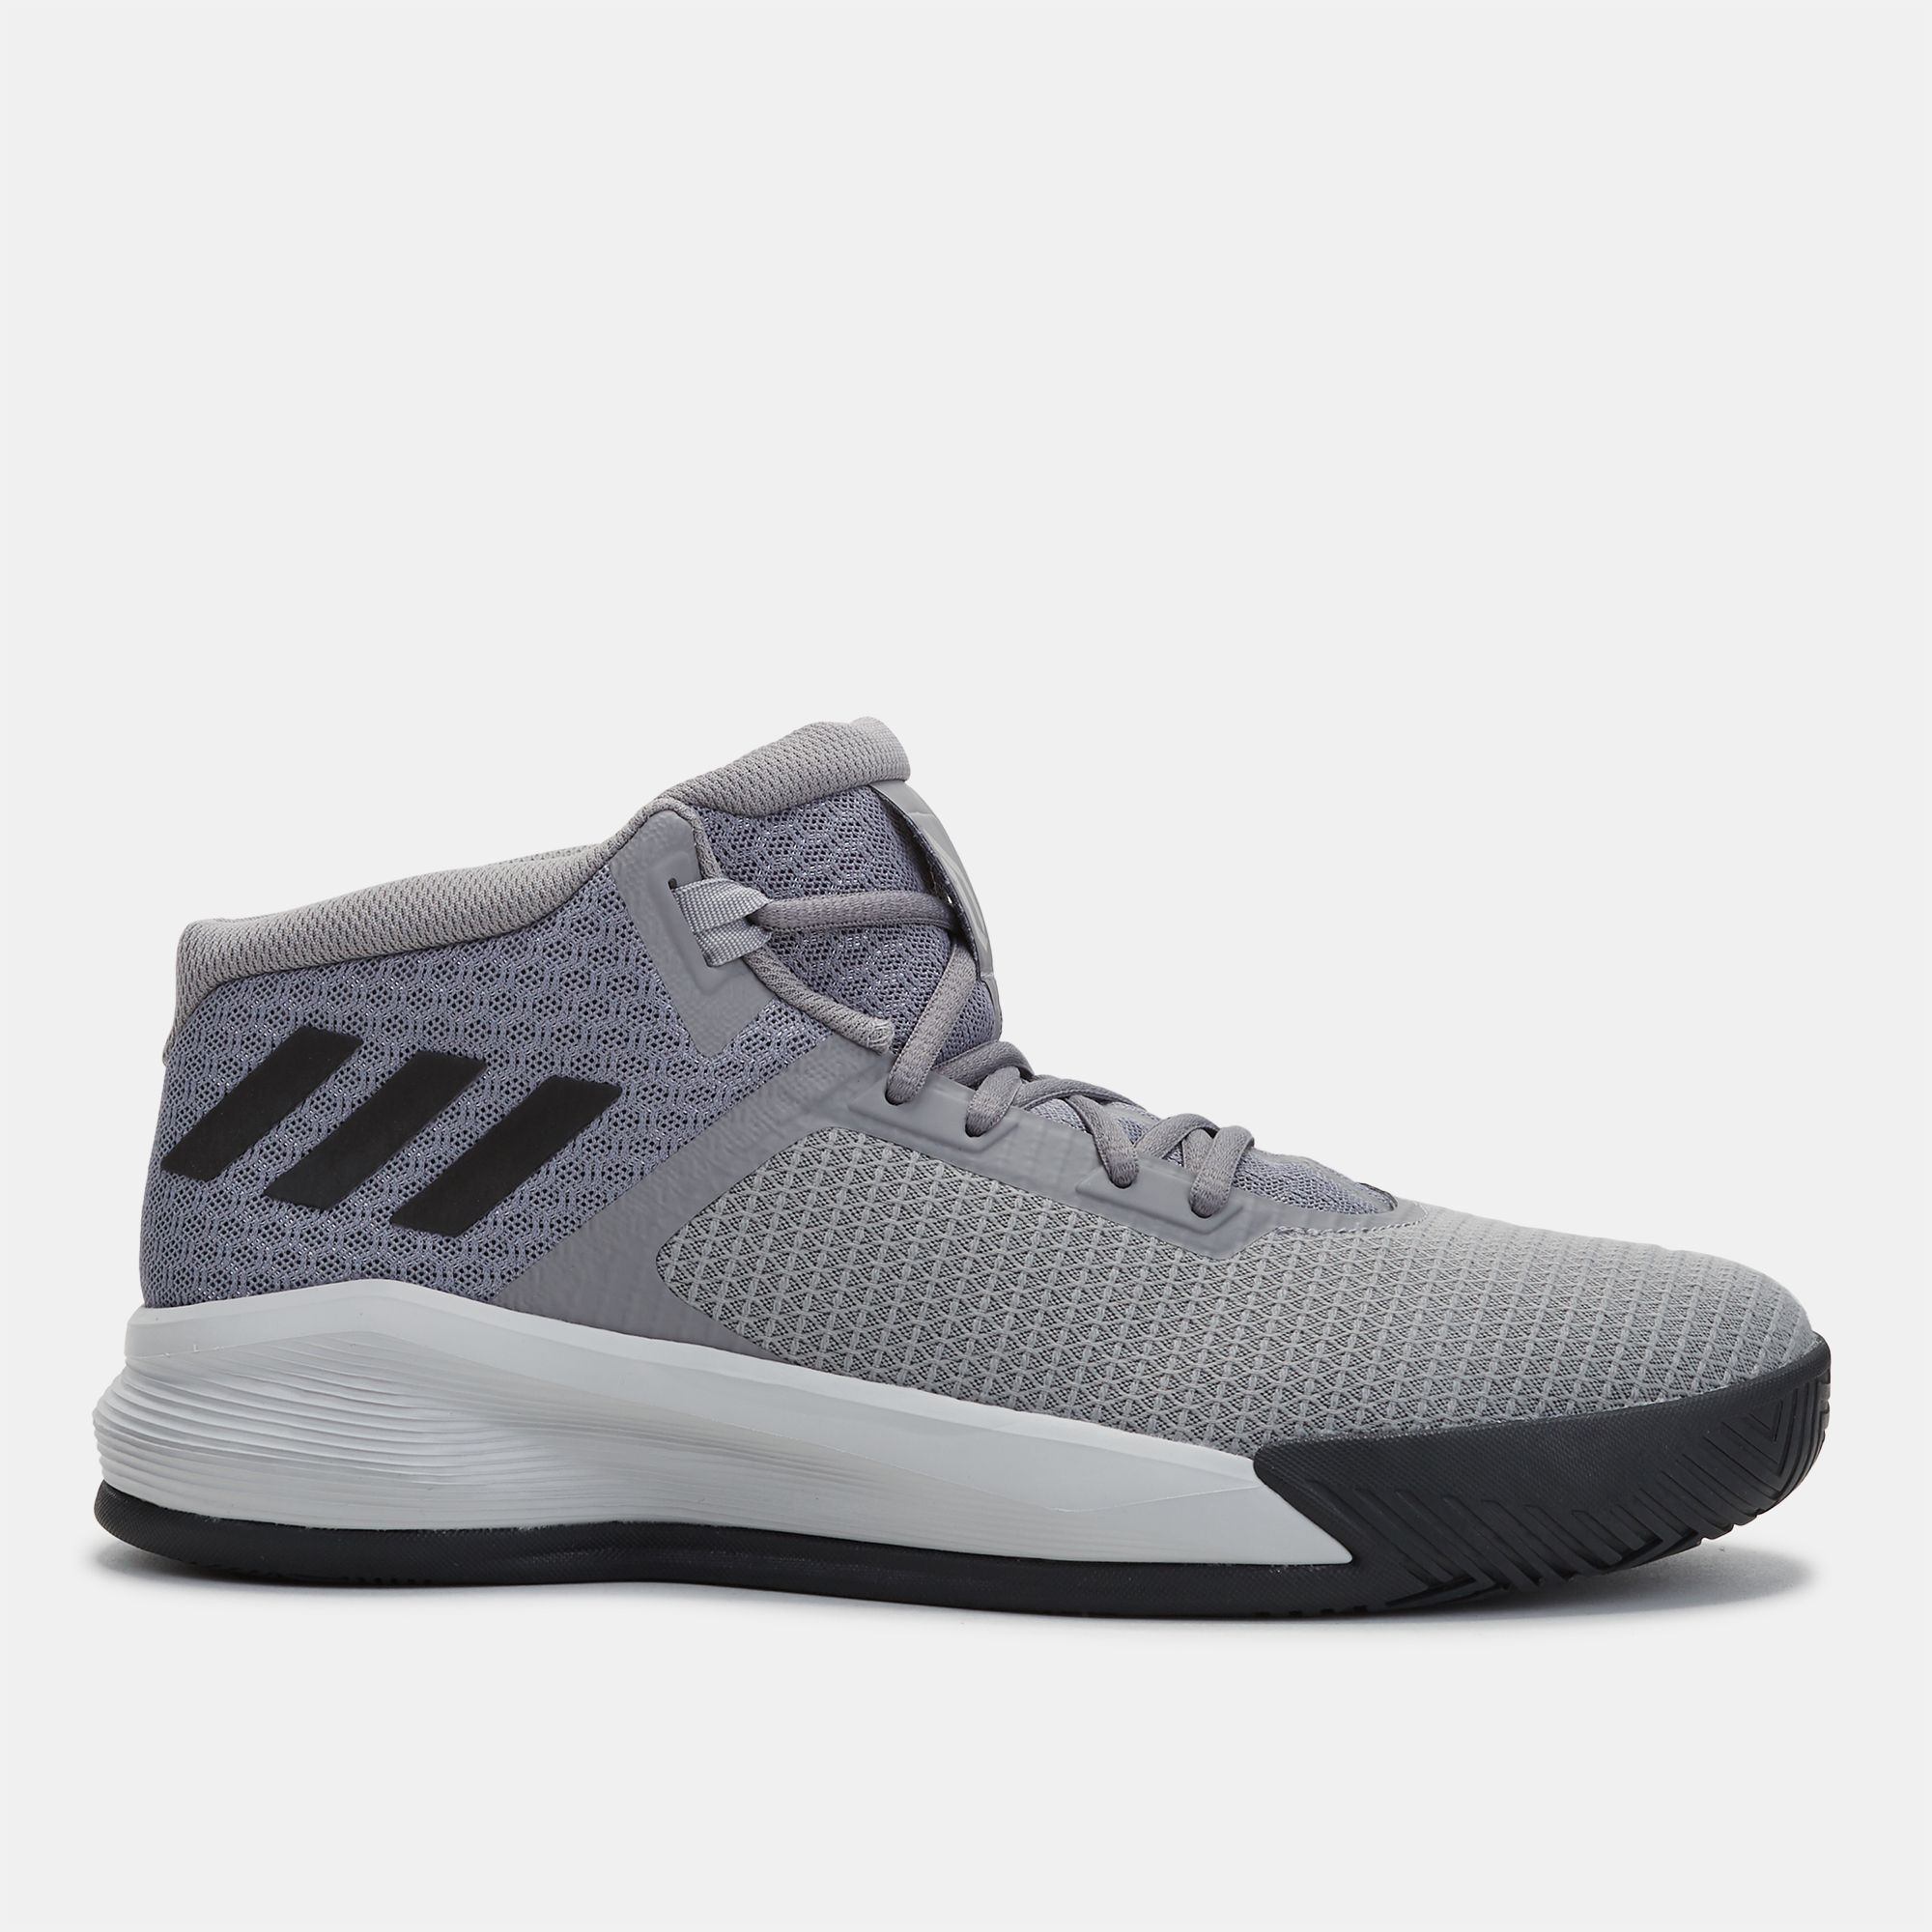 promo code 2d906 ae481 ... adidas damian lillard brookfield shoe adidas damian lillard brookfield  shoe adidas dame 4 mens basketball ...